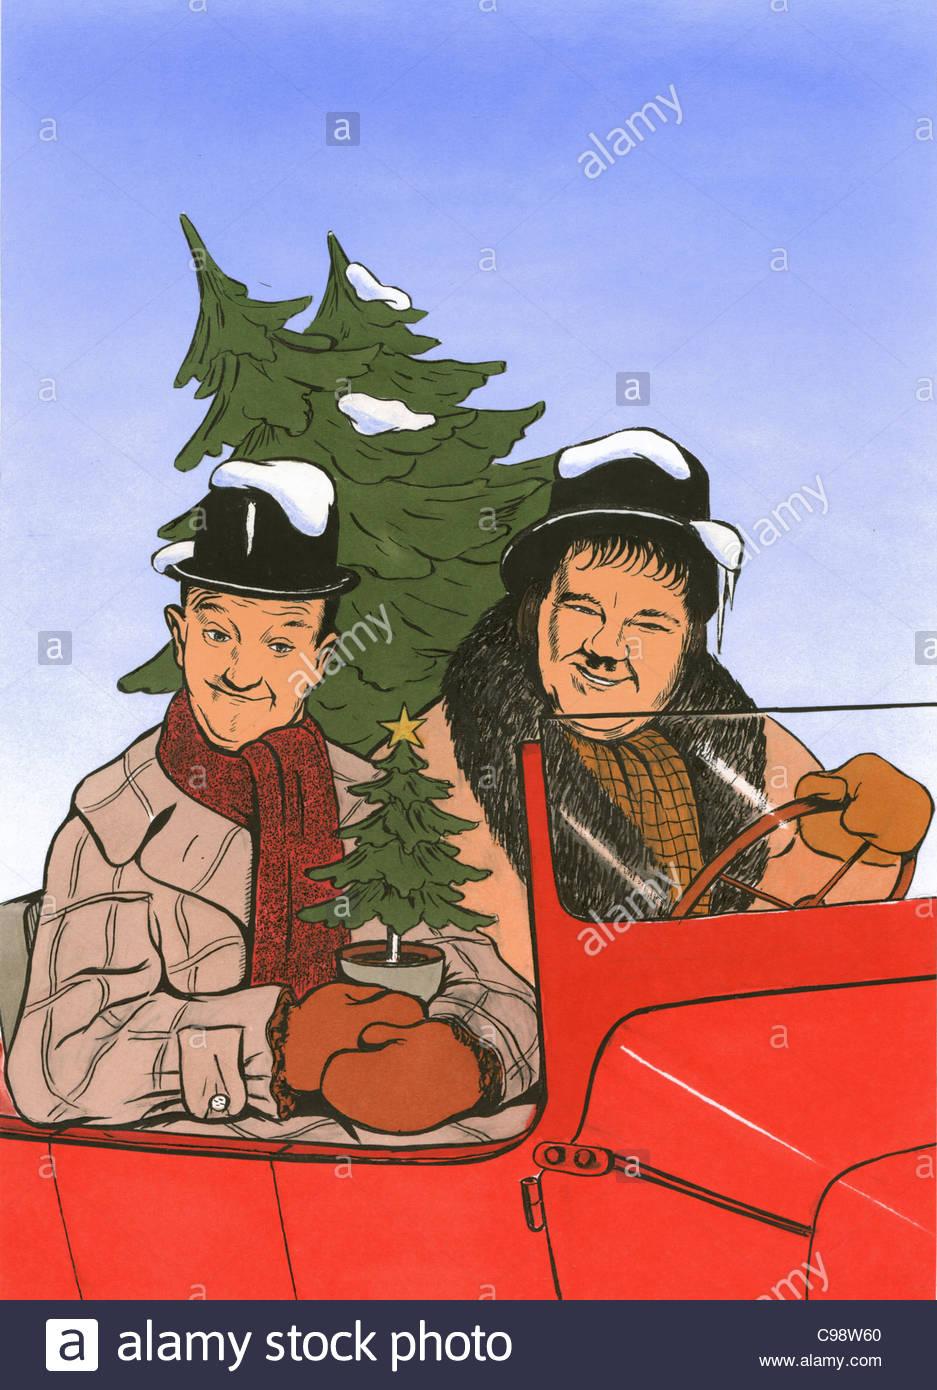 Thick And Stupid With Christmas Tree Auto Christmas Tree Stock.